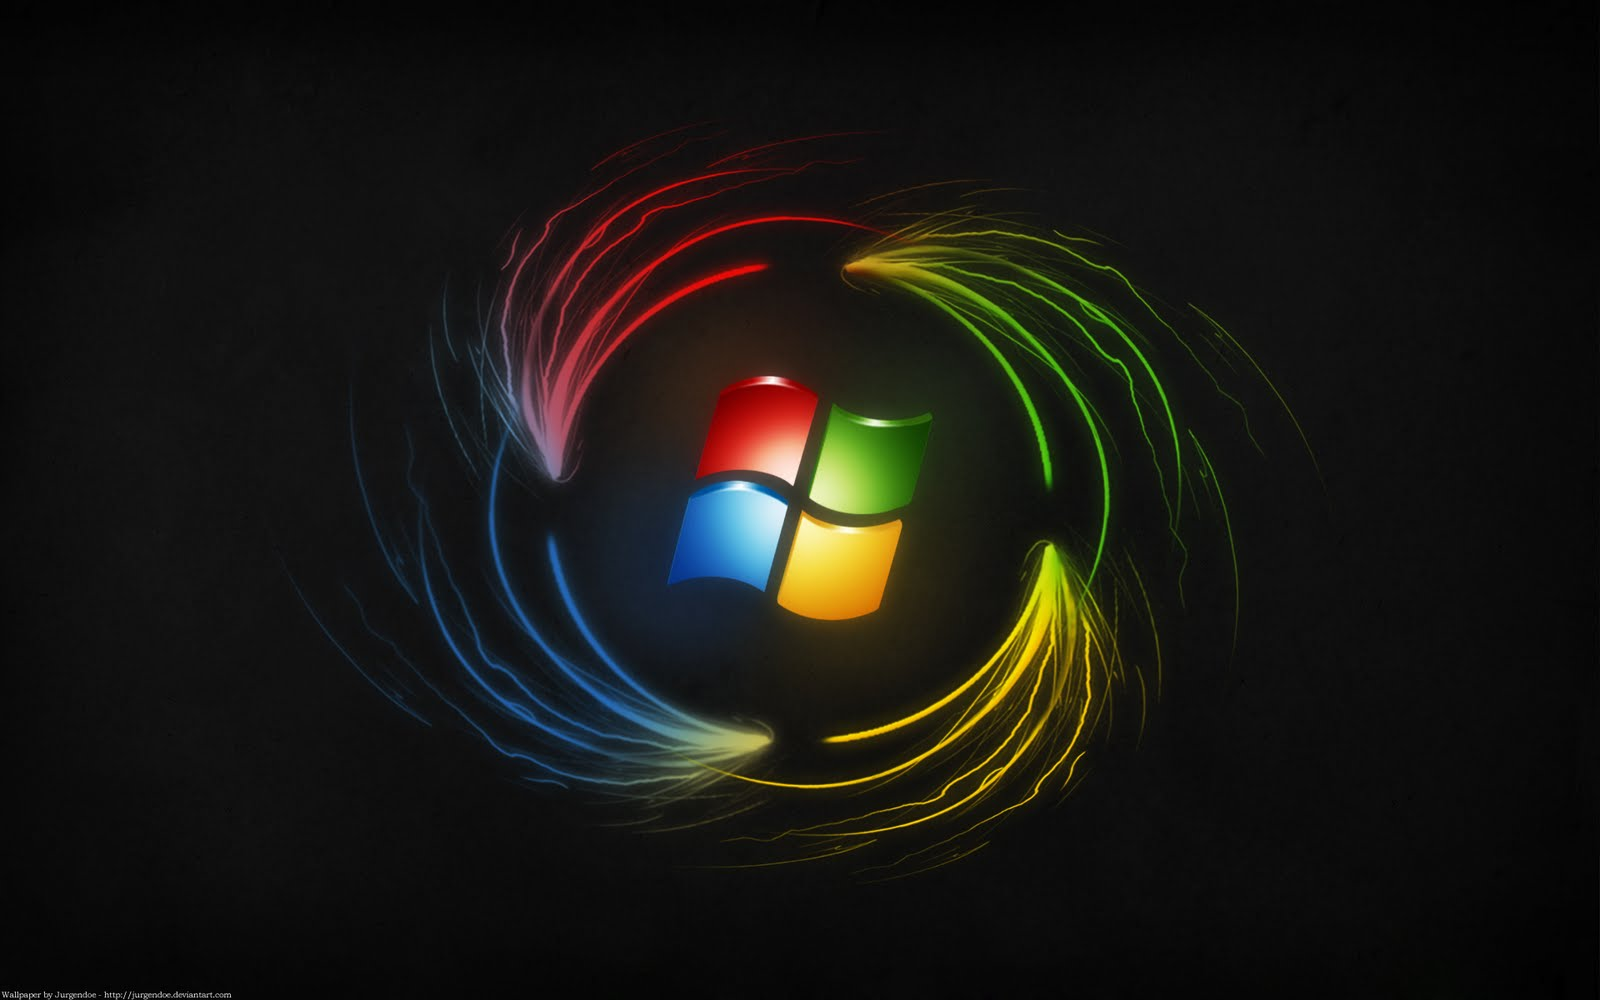 Windows 8 Wallpaper Image Packet